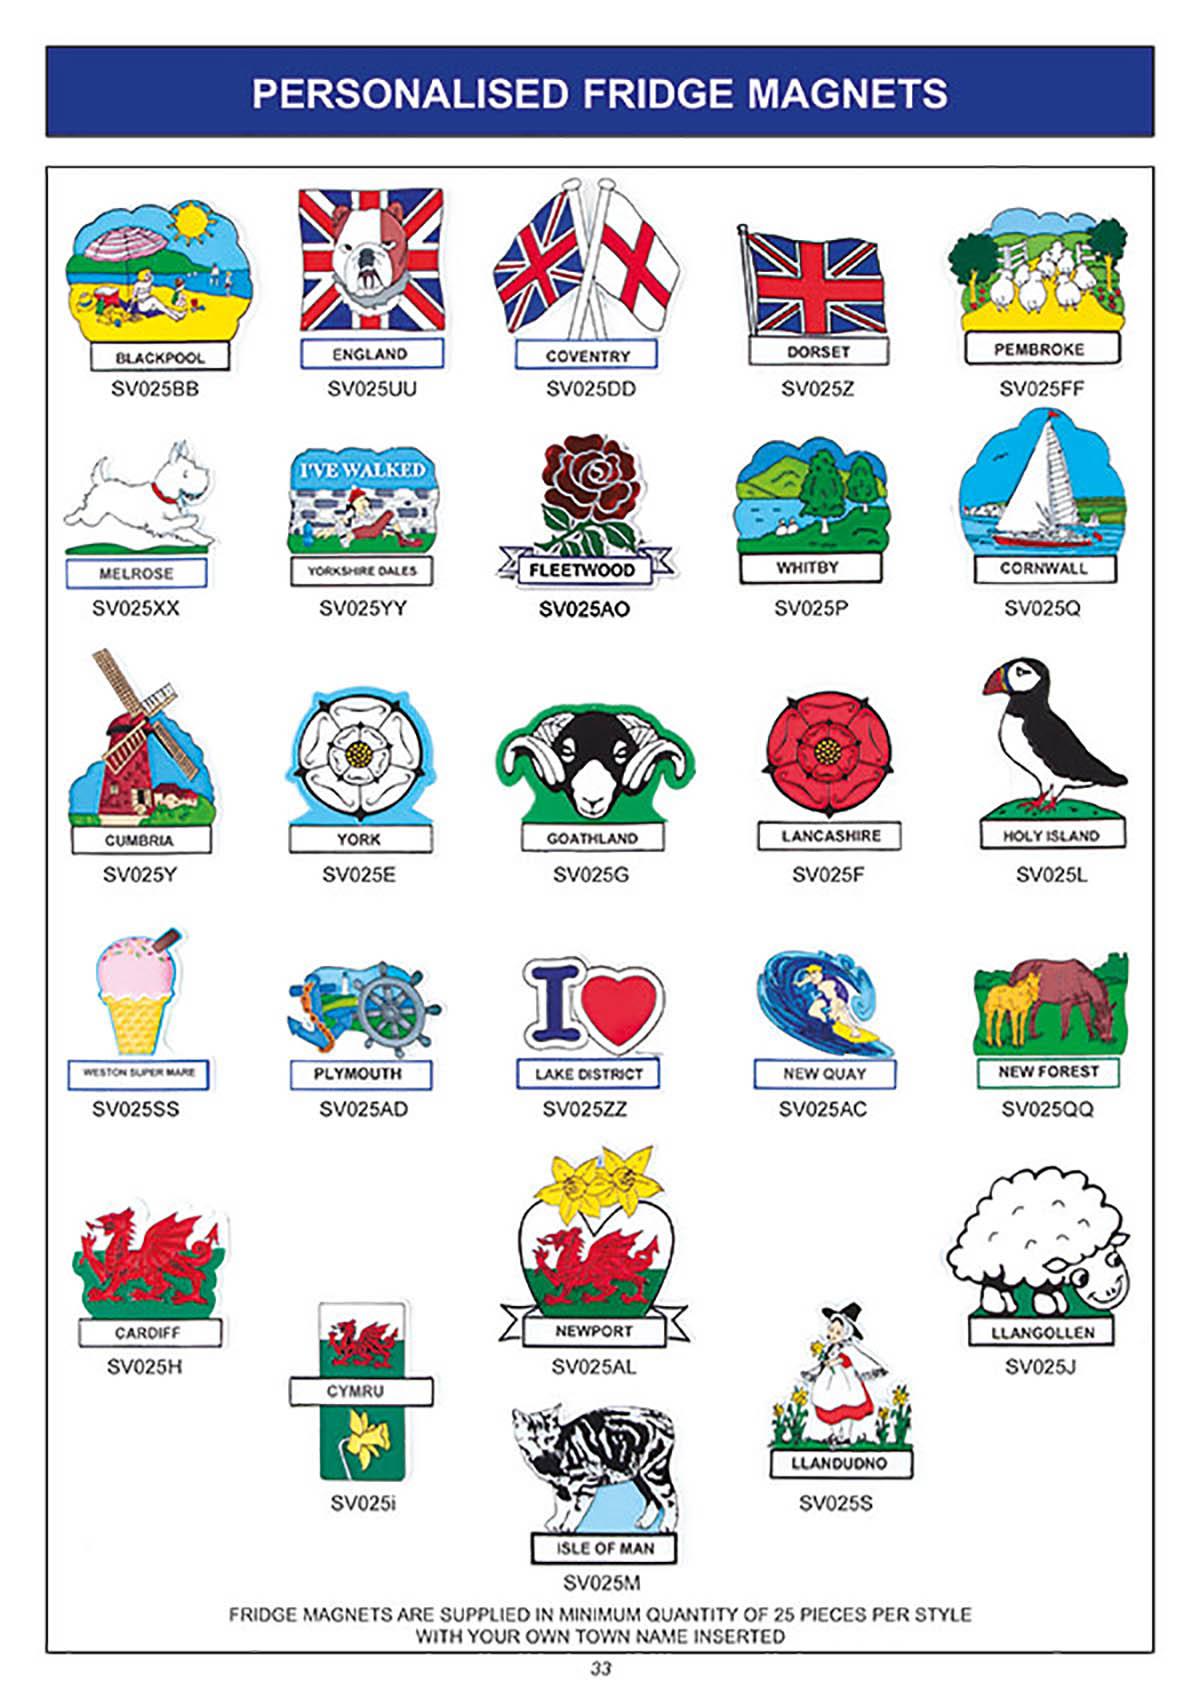 souvenir personalised fridge magnets flags